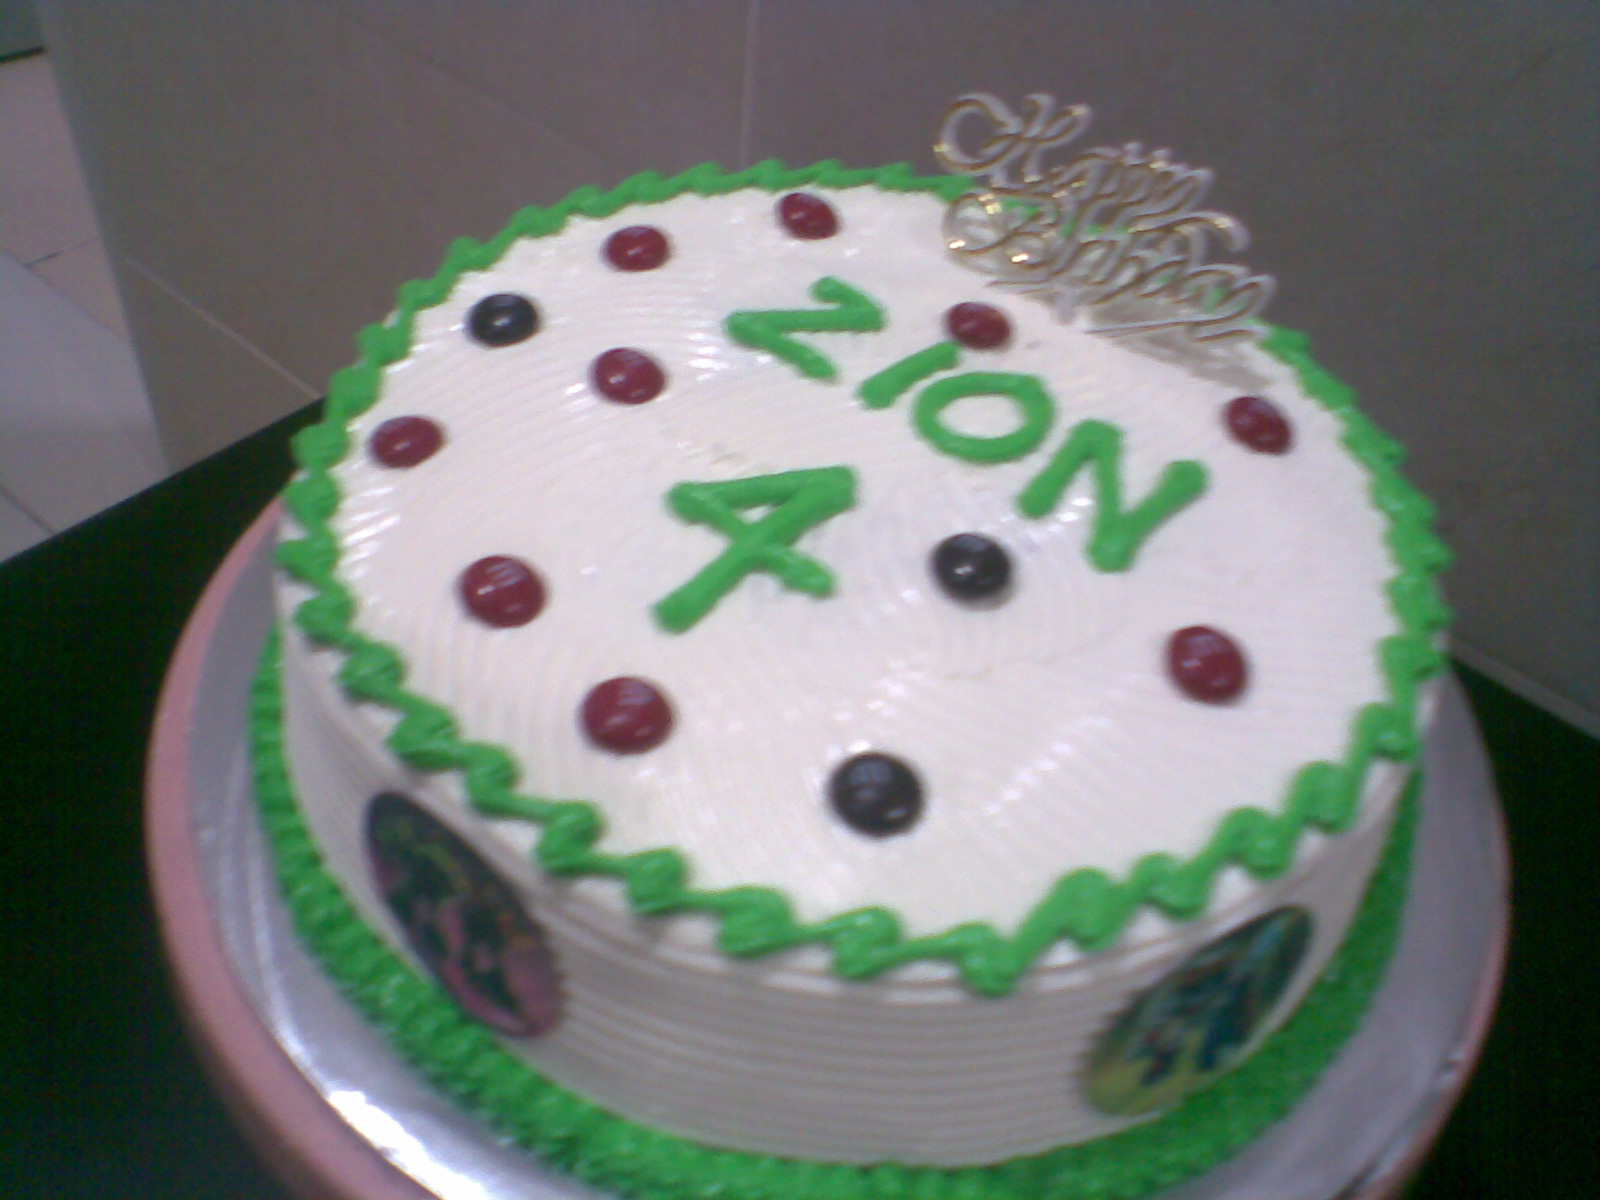 royal icing birthday cakes